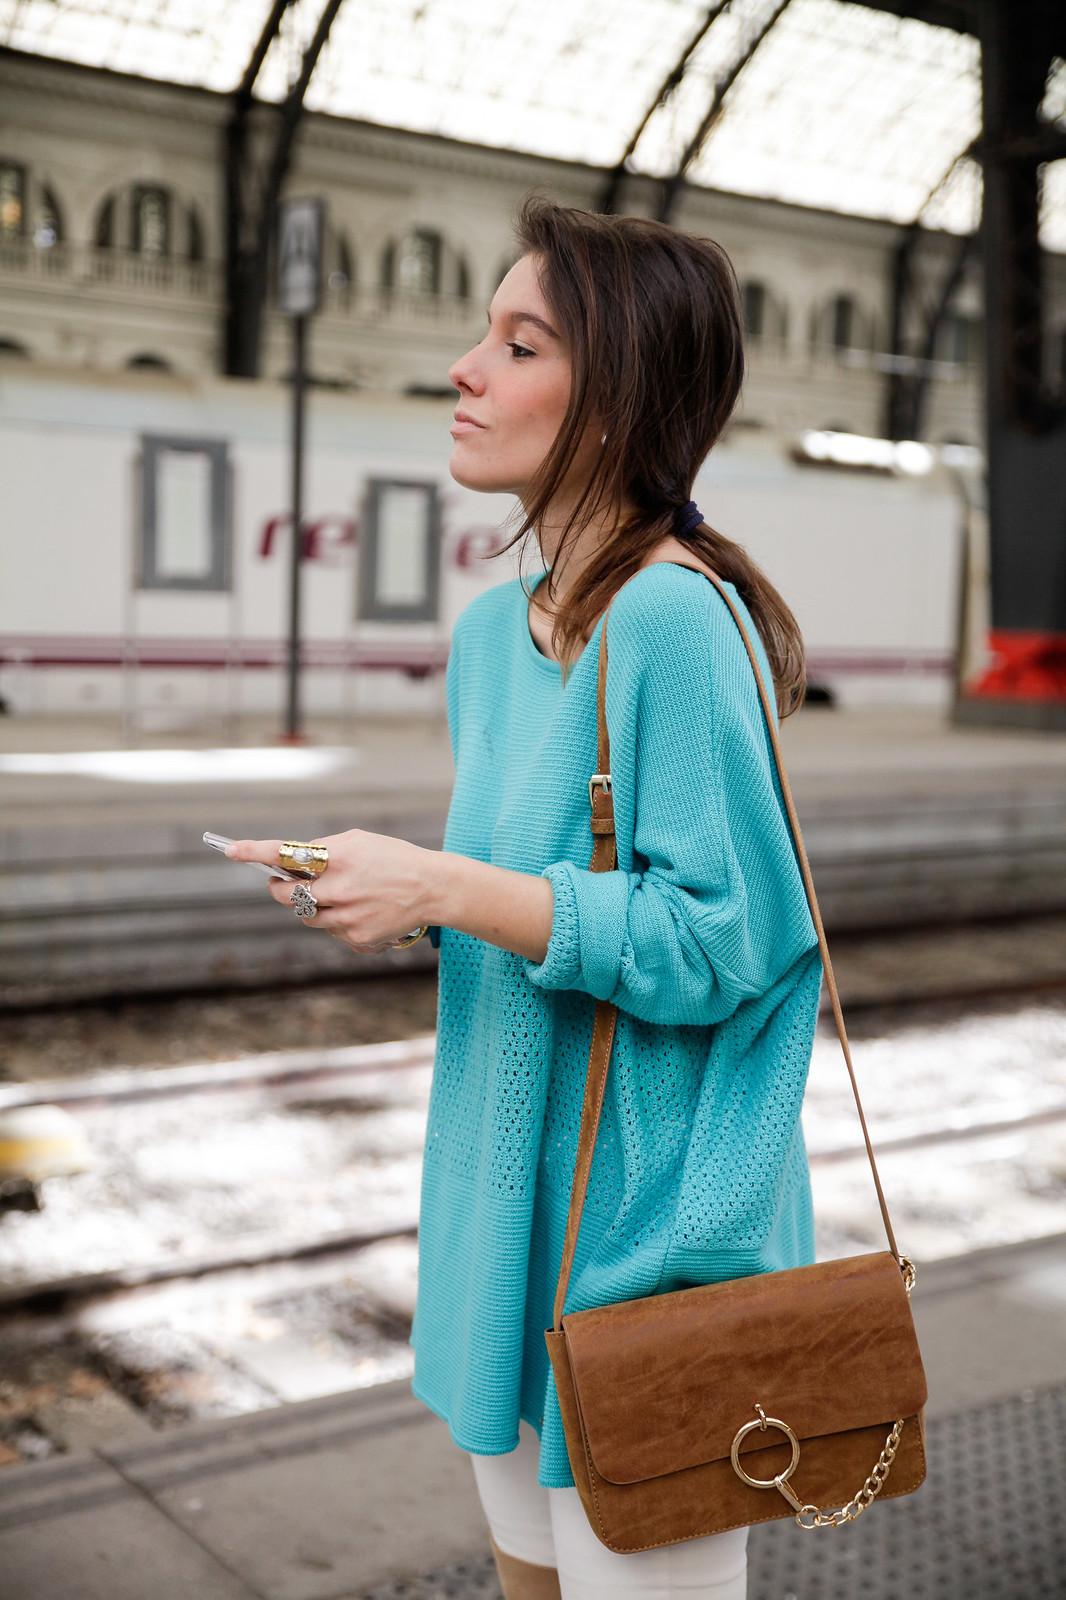 010_como_combinar_la_ropa_verde_turquesa_ideas_look_street_style_theguestgirl_ruga_boots_fringes_barcelona_influencer_top_blogger